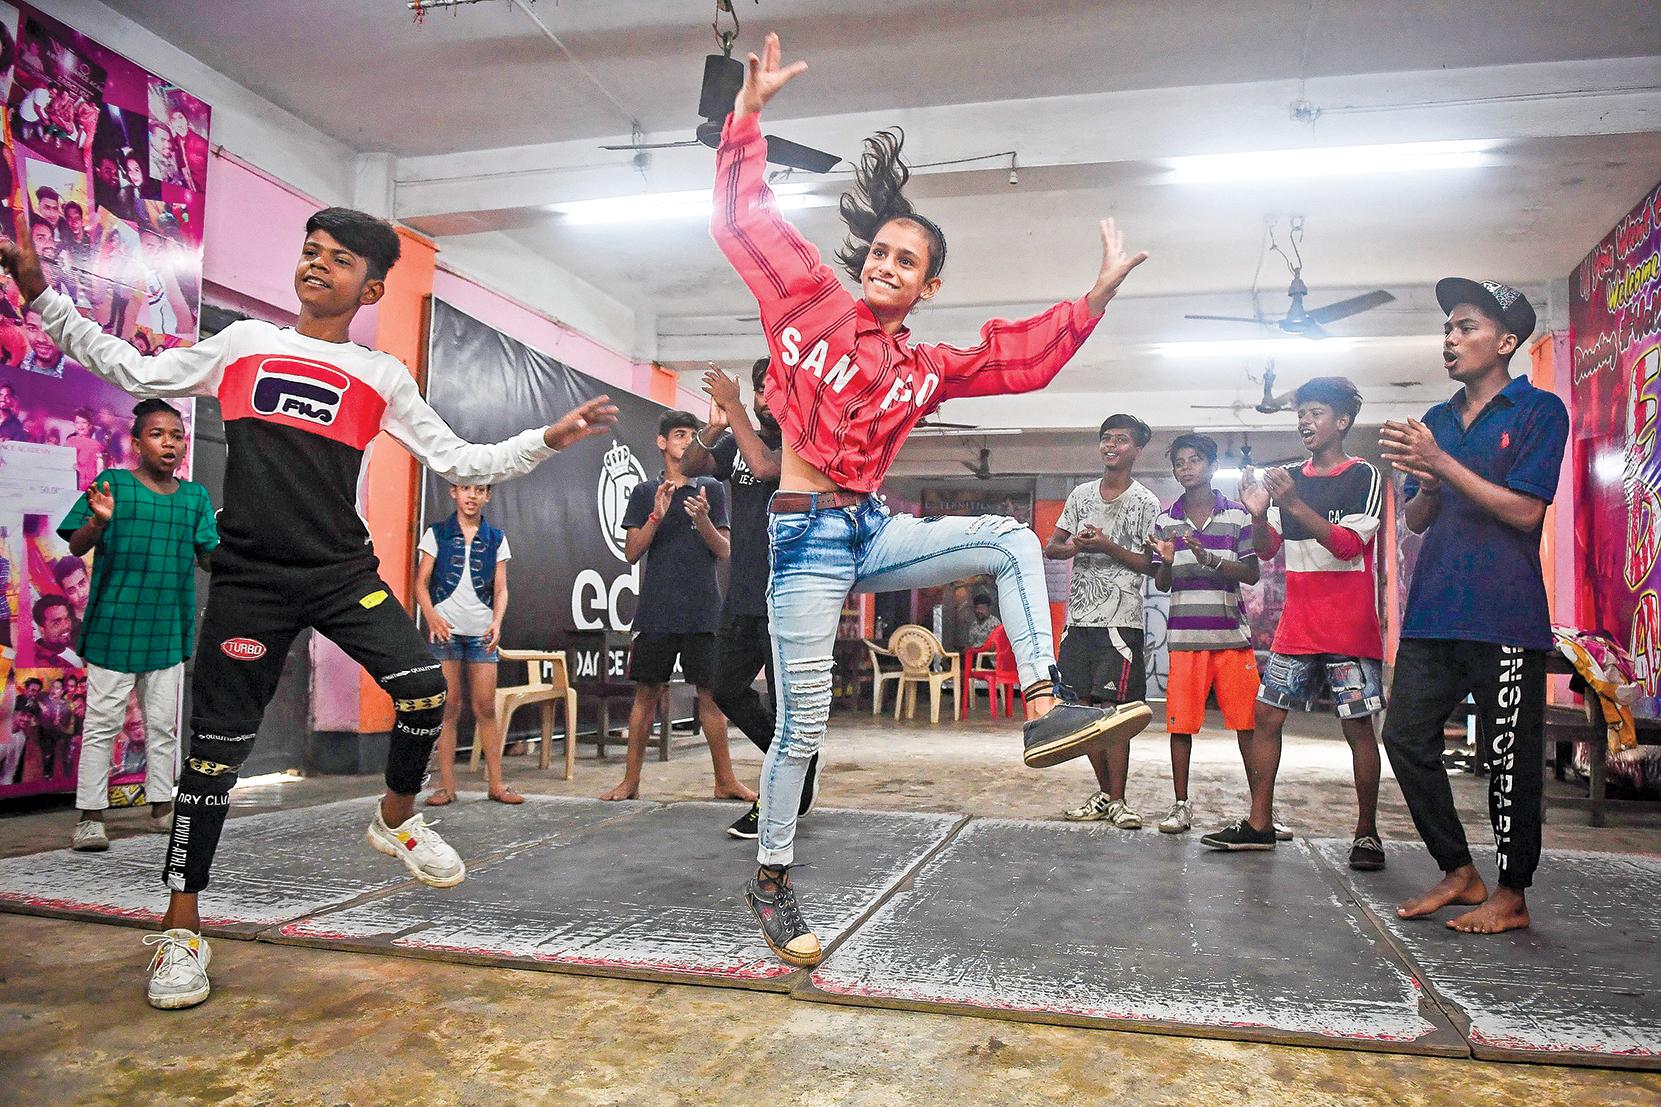 t TikTok用逗樂子的手法營造「認知輕鬆度」,使用者會毫不懷疑地接受所有被灌輸的內容。圖為一群印度年輕人在TikTok平台錄製網絡流行視頻。(DIBYANGSHU SARKAR/AFP via Getty Images)